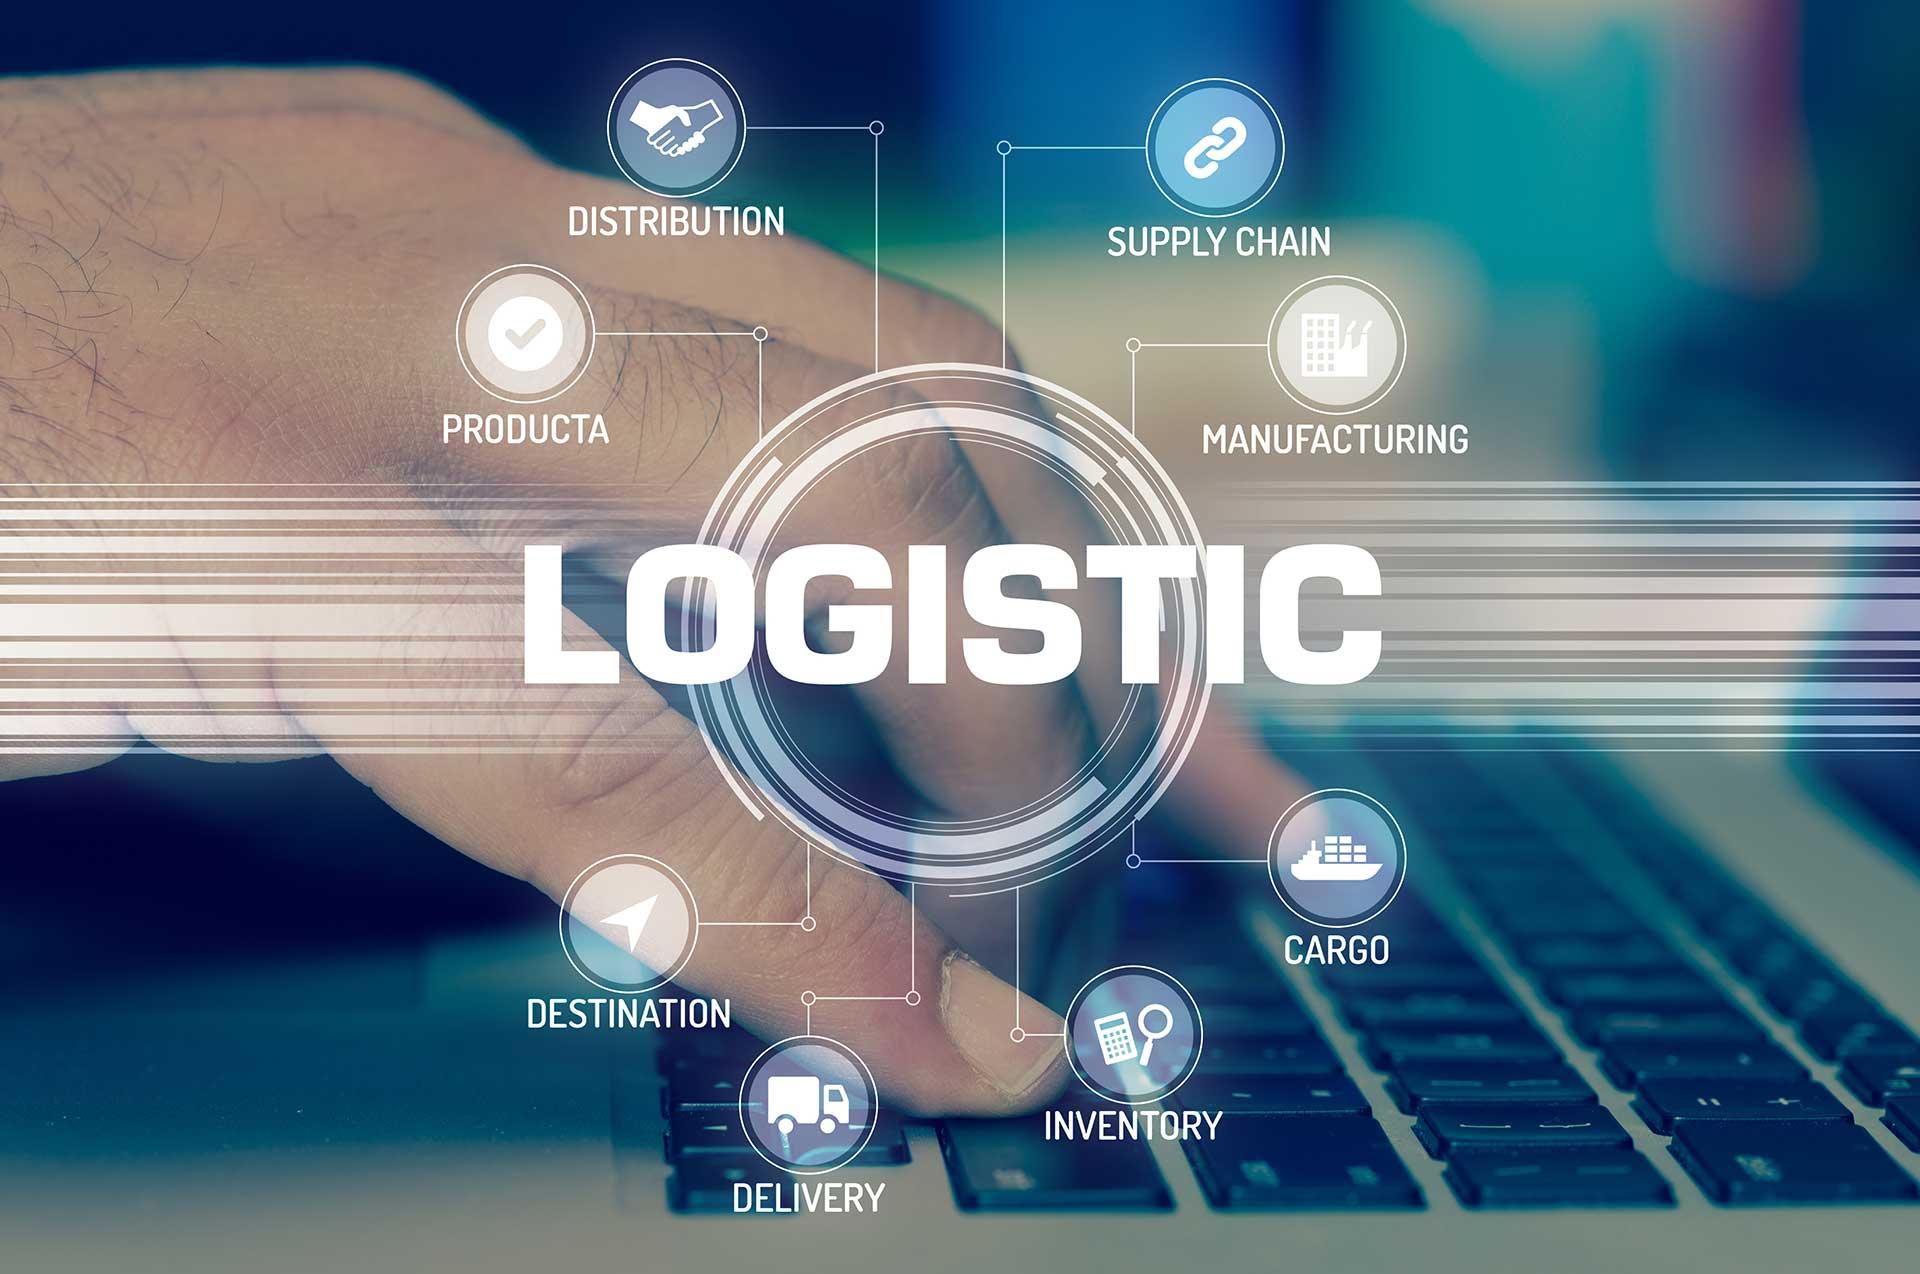 marketing-nganh-logistics-5